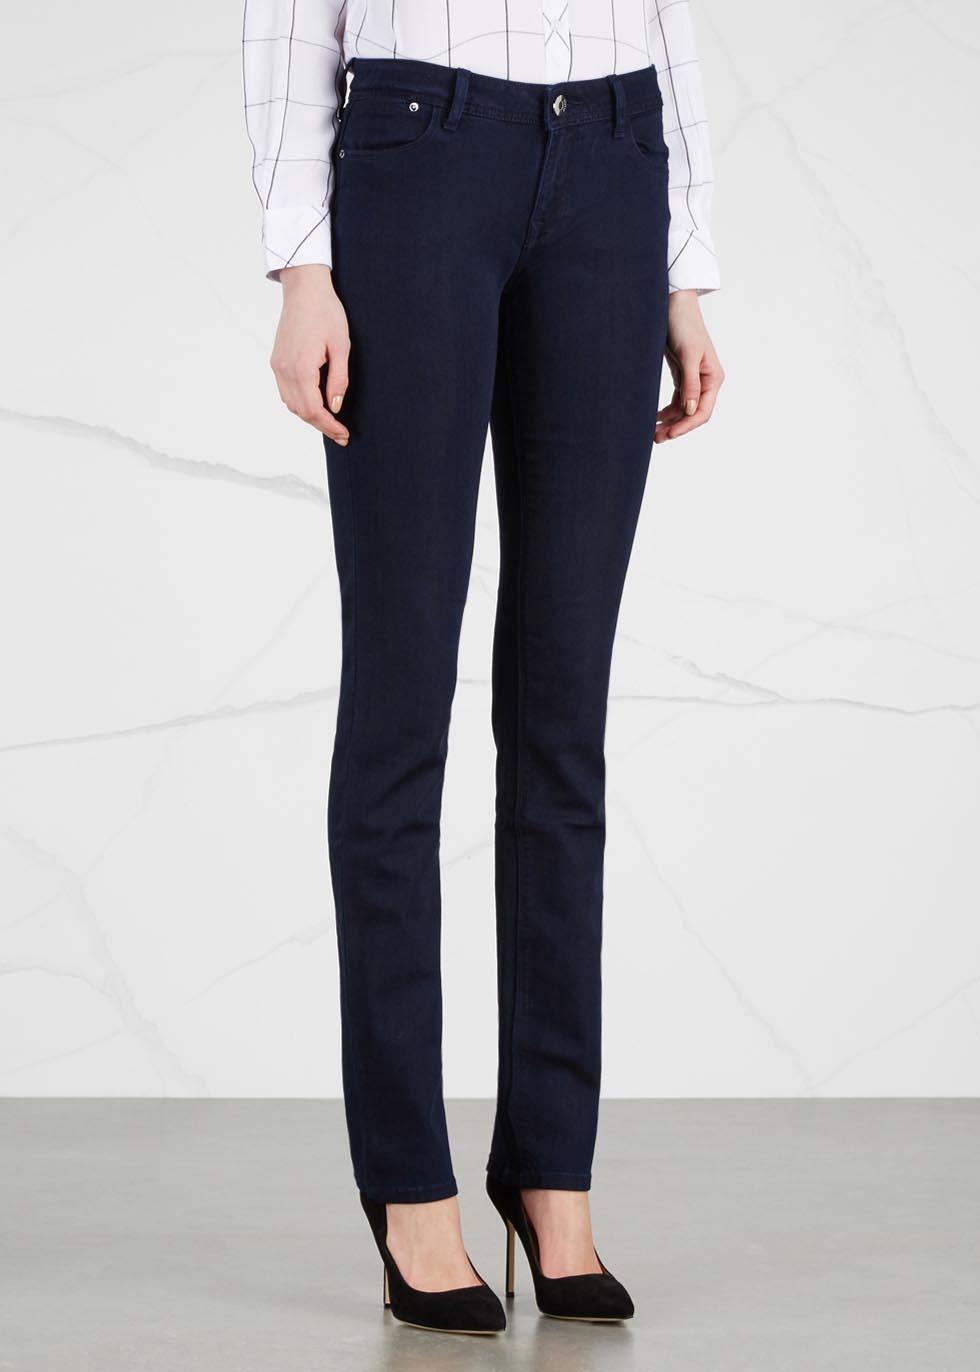 Coco Curvy dark blue slim straight-leg jeans - DL1961